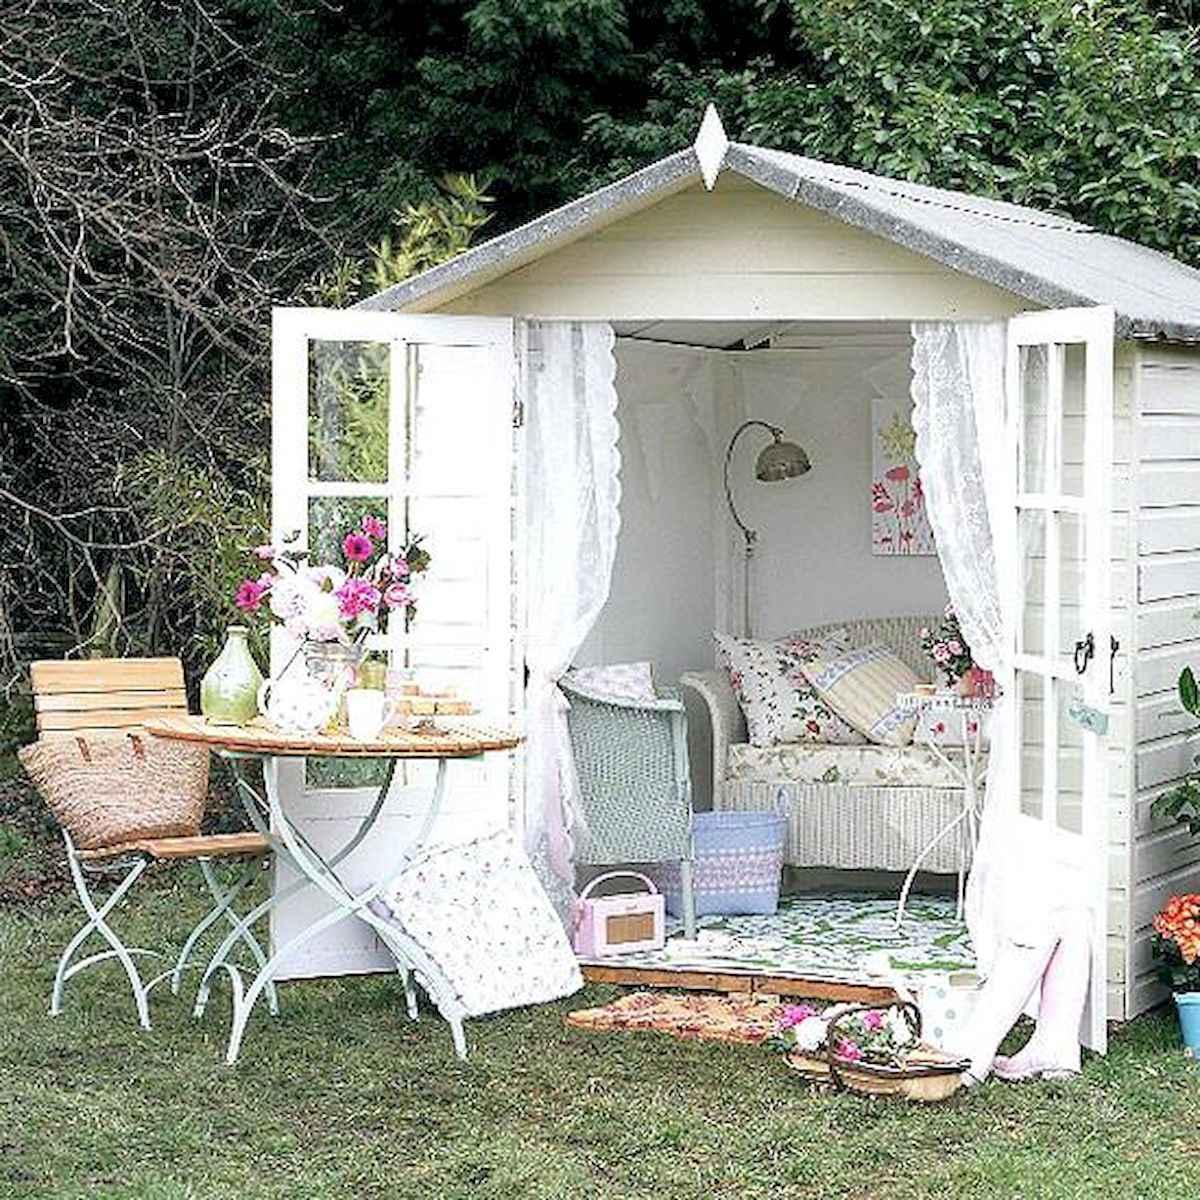 50 awesome backyard summer decor ideas make your summer beautiful (38)